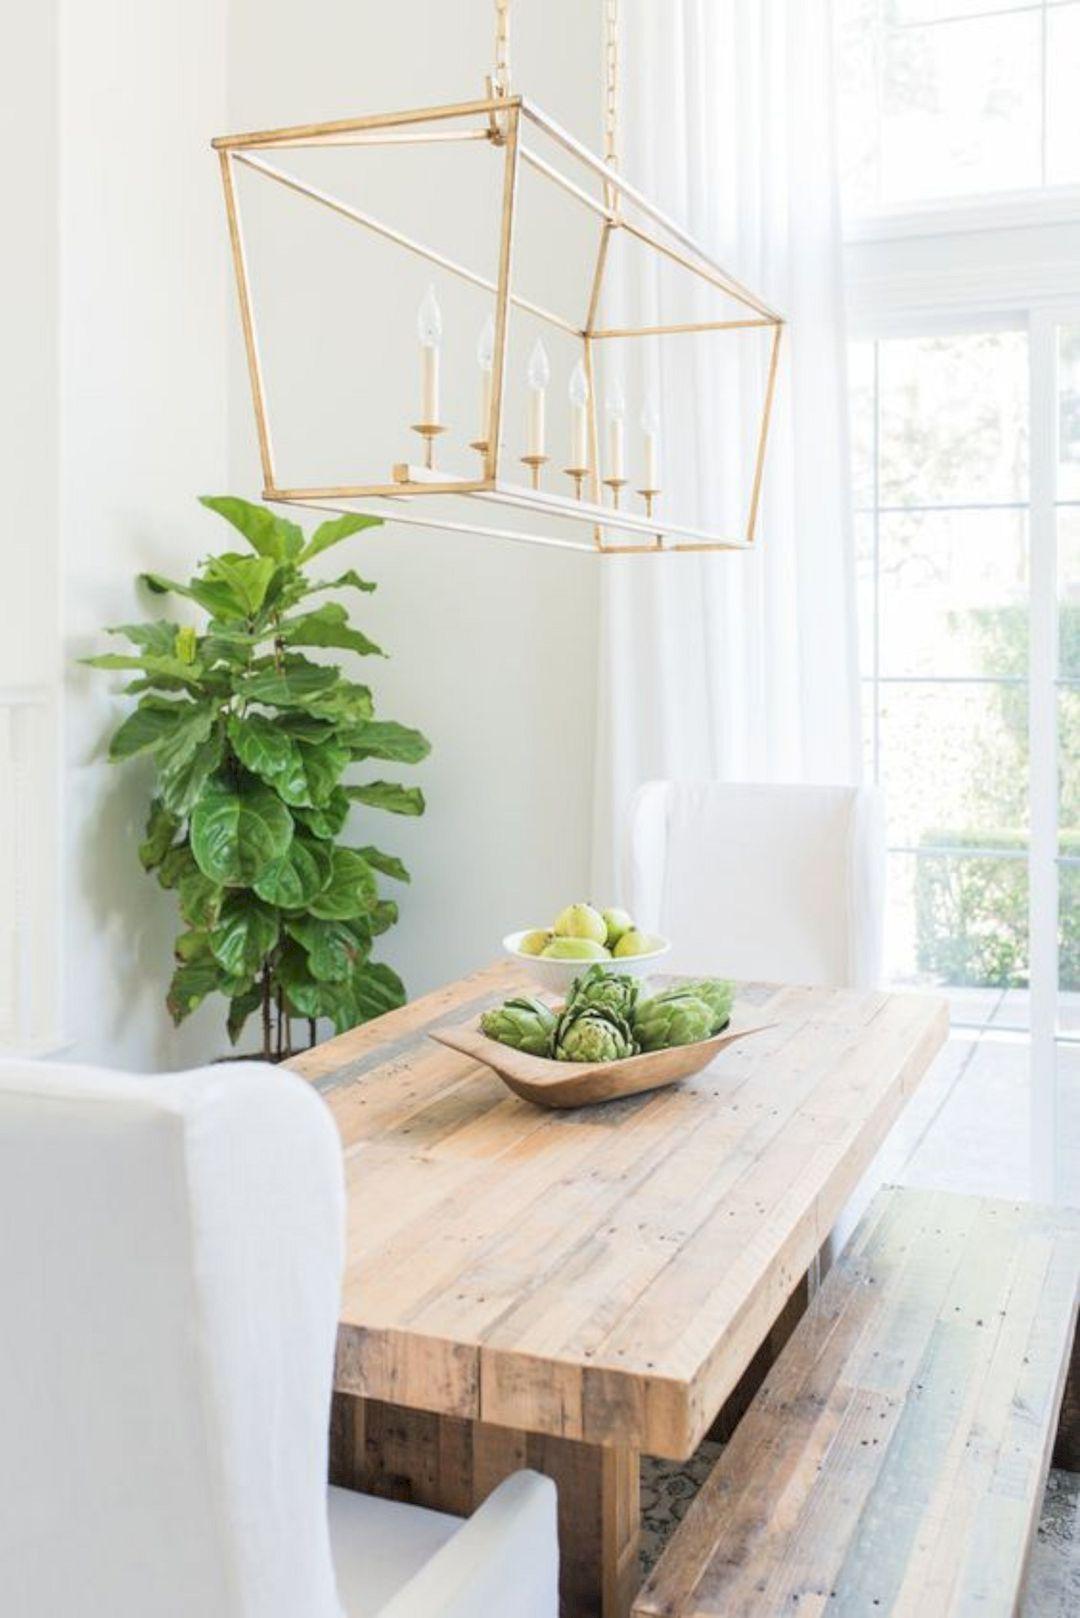 3 Simple Interior Design Ideas For Living Room Gold Dining Room Dining Room Light Fixtures Dining Room Makeover